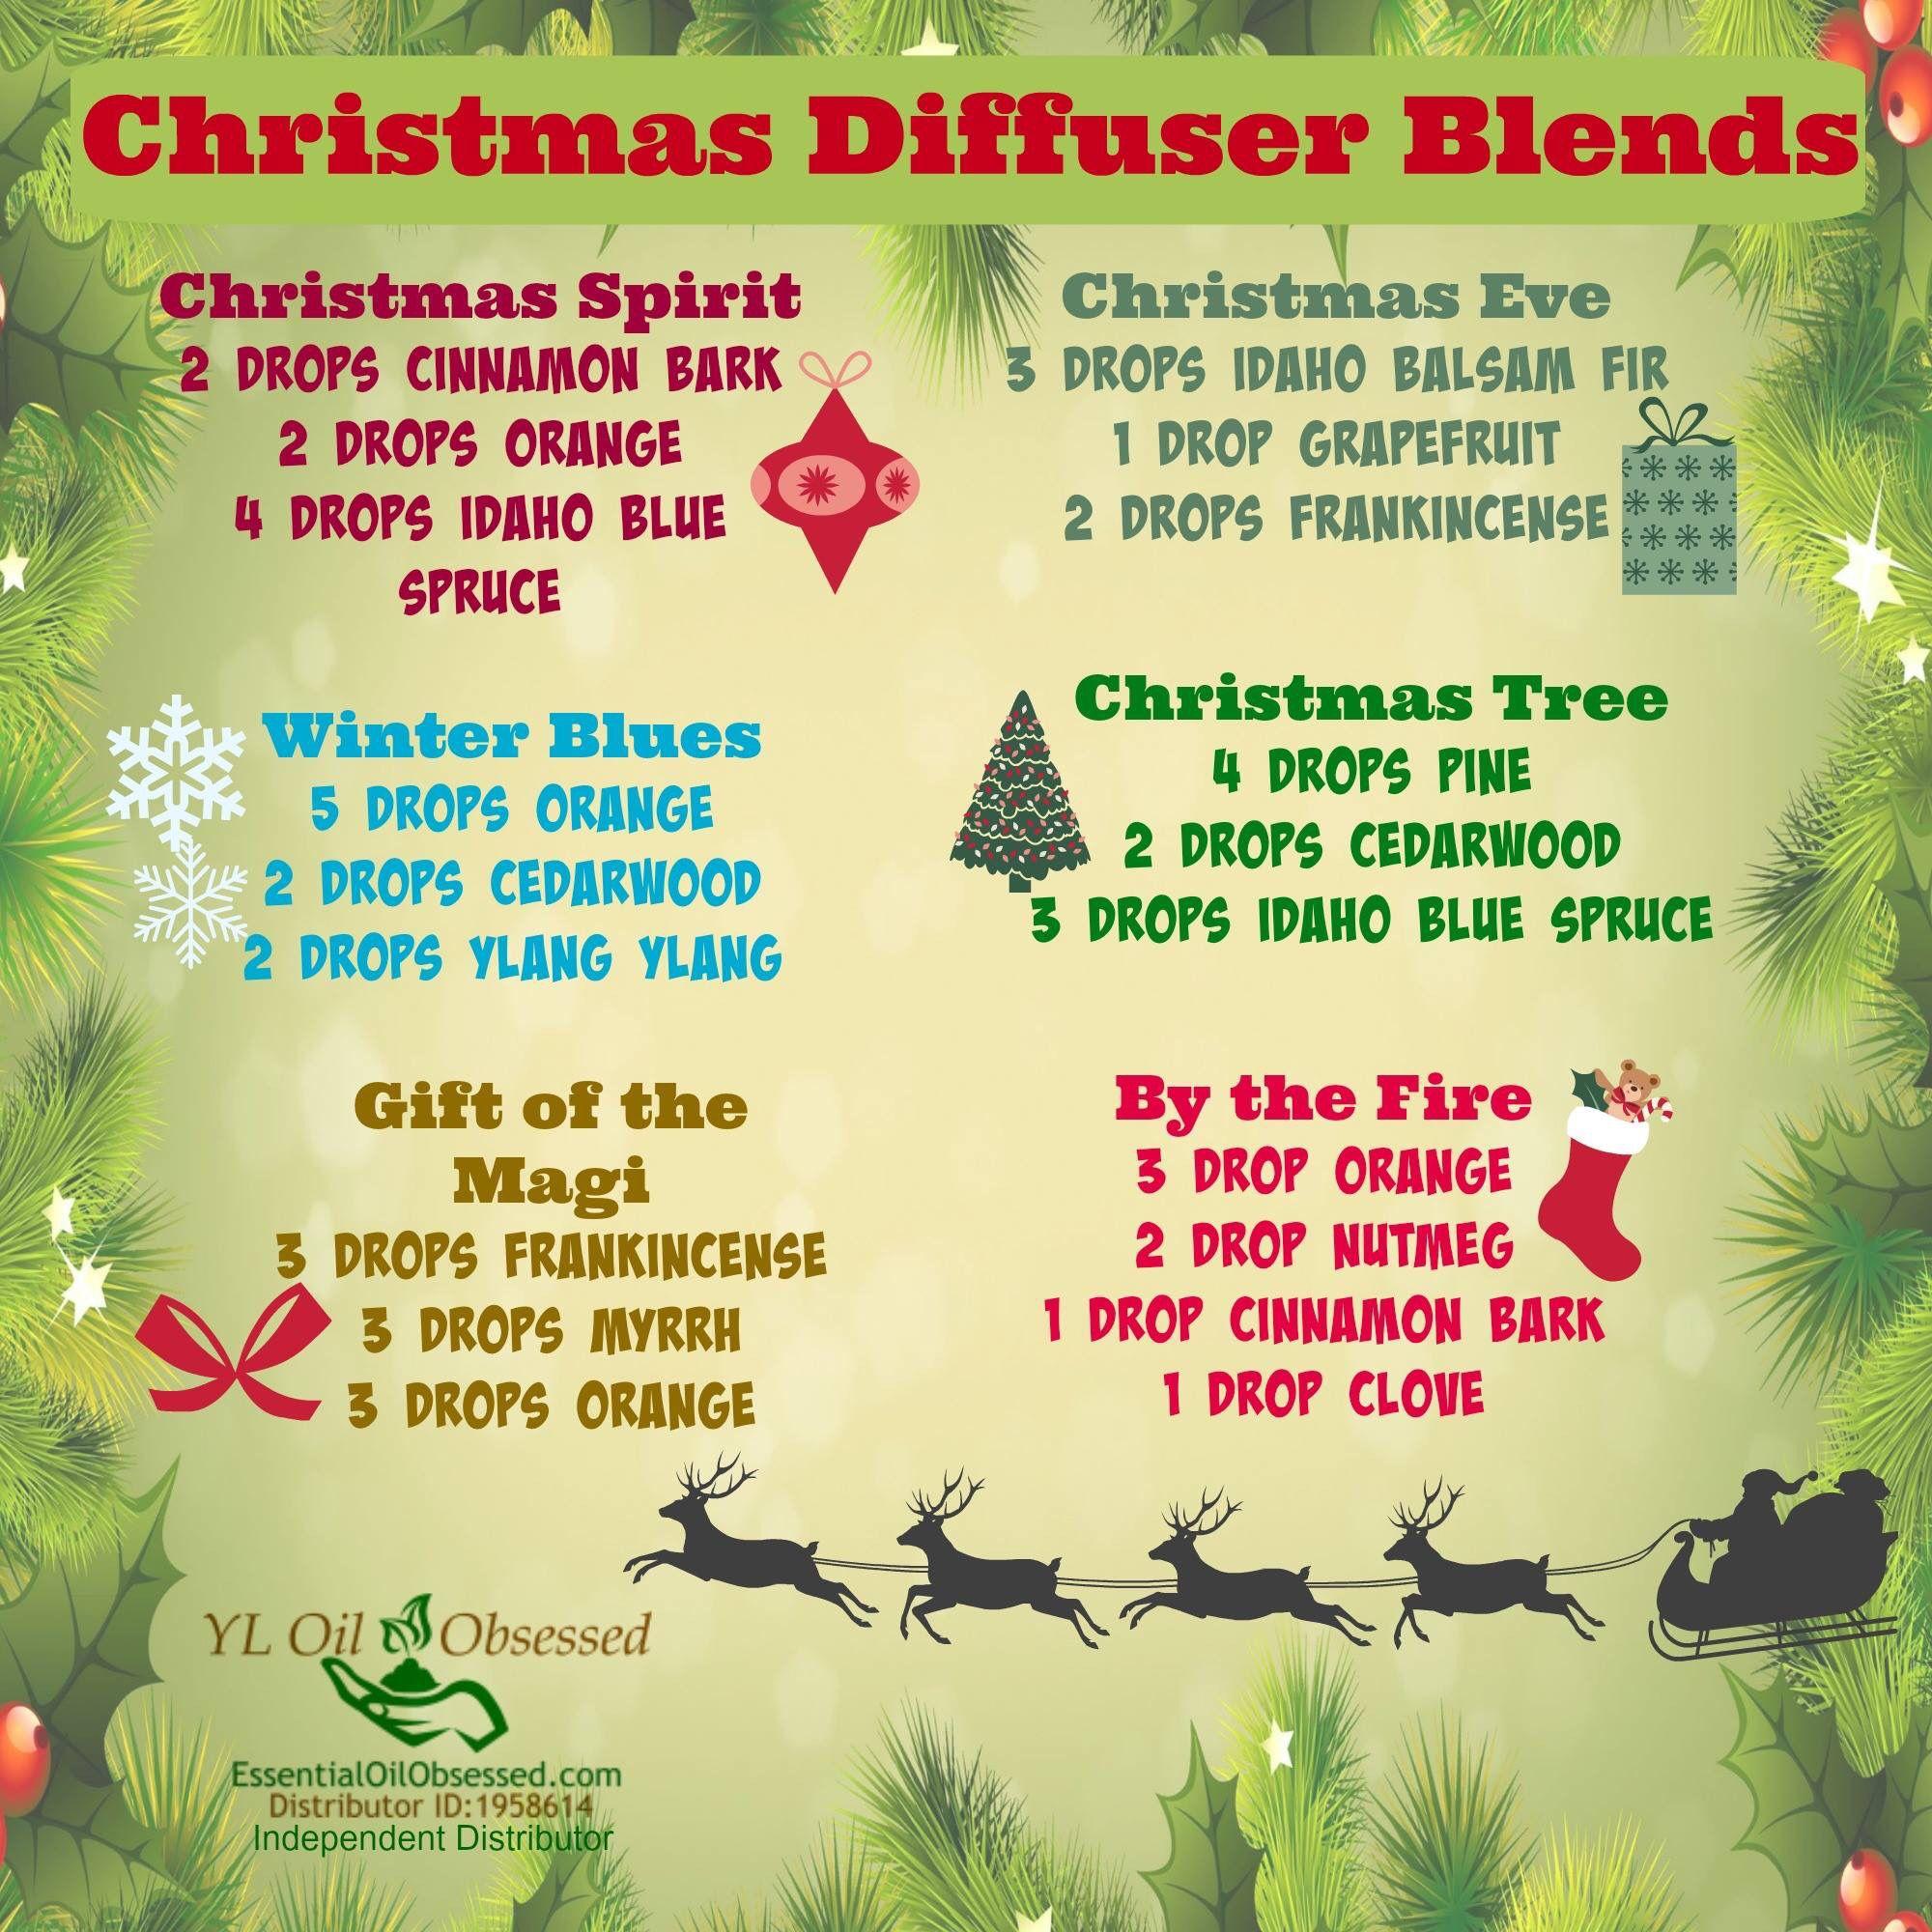 Christmas diffuser